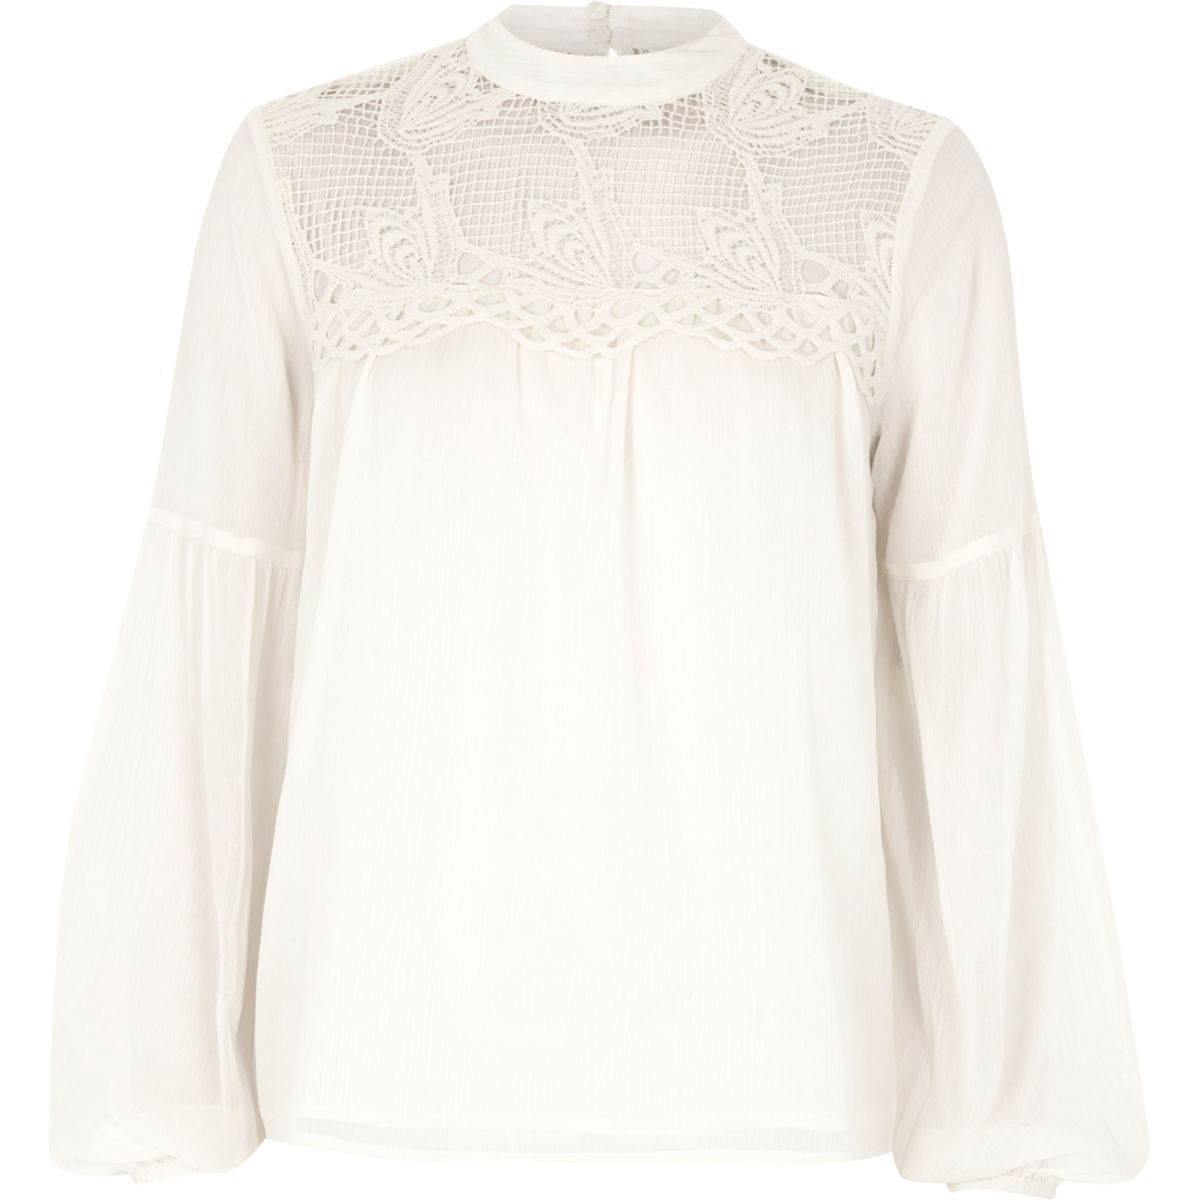 Cream cutwork bell sleeve blouse